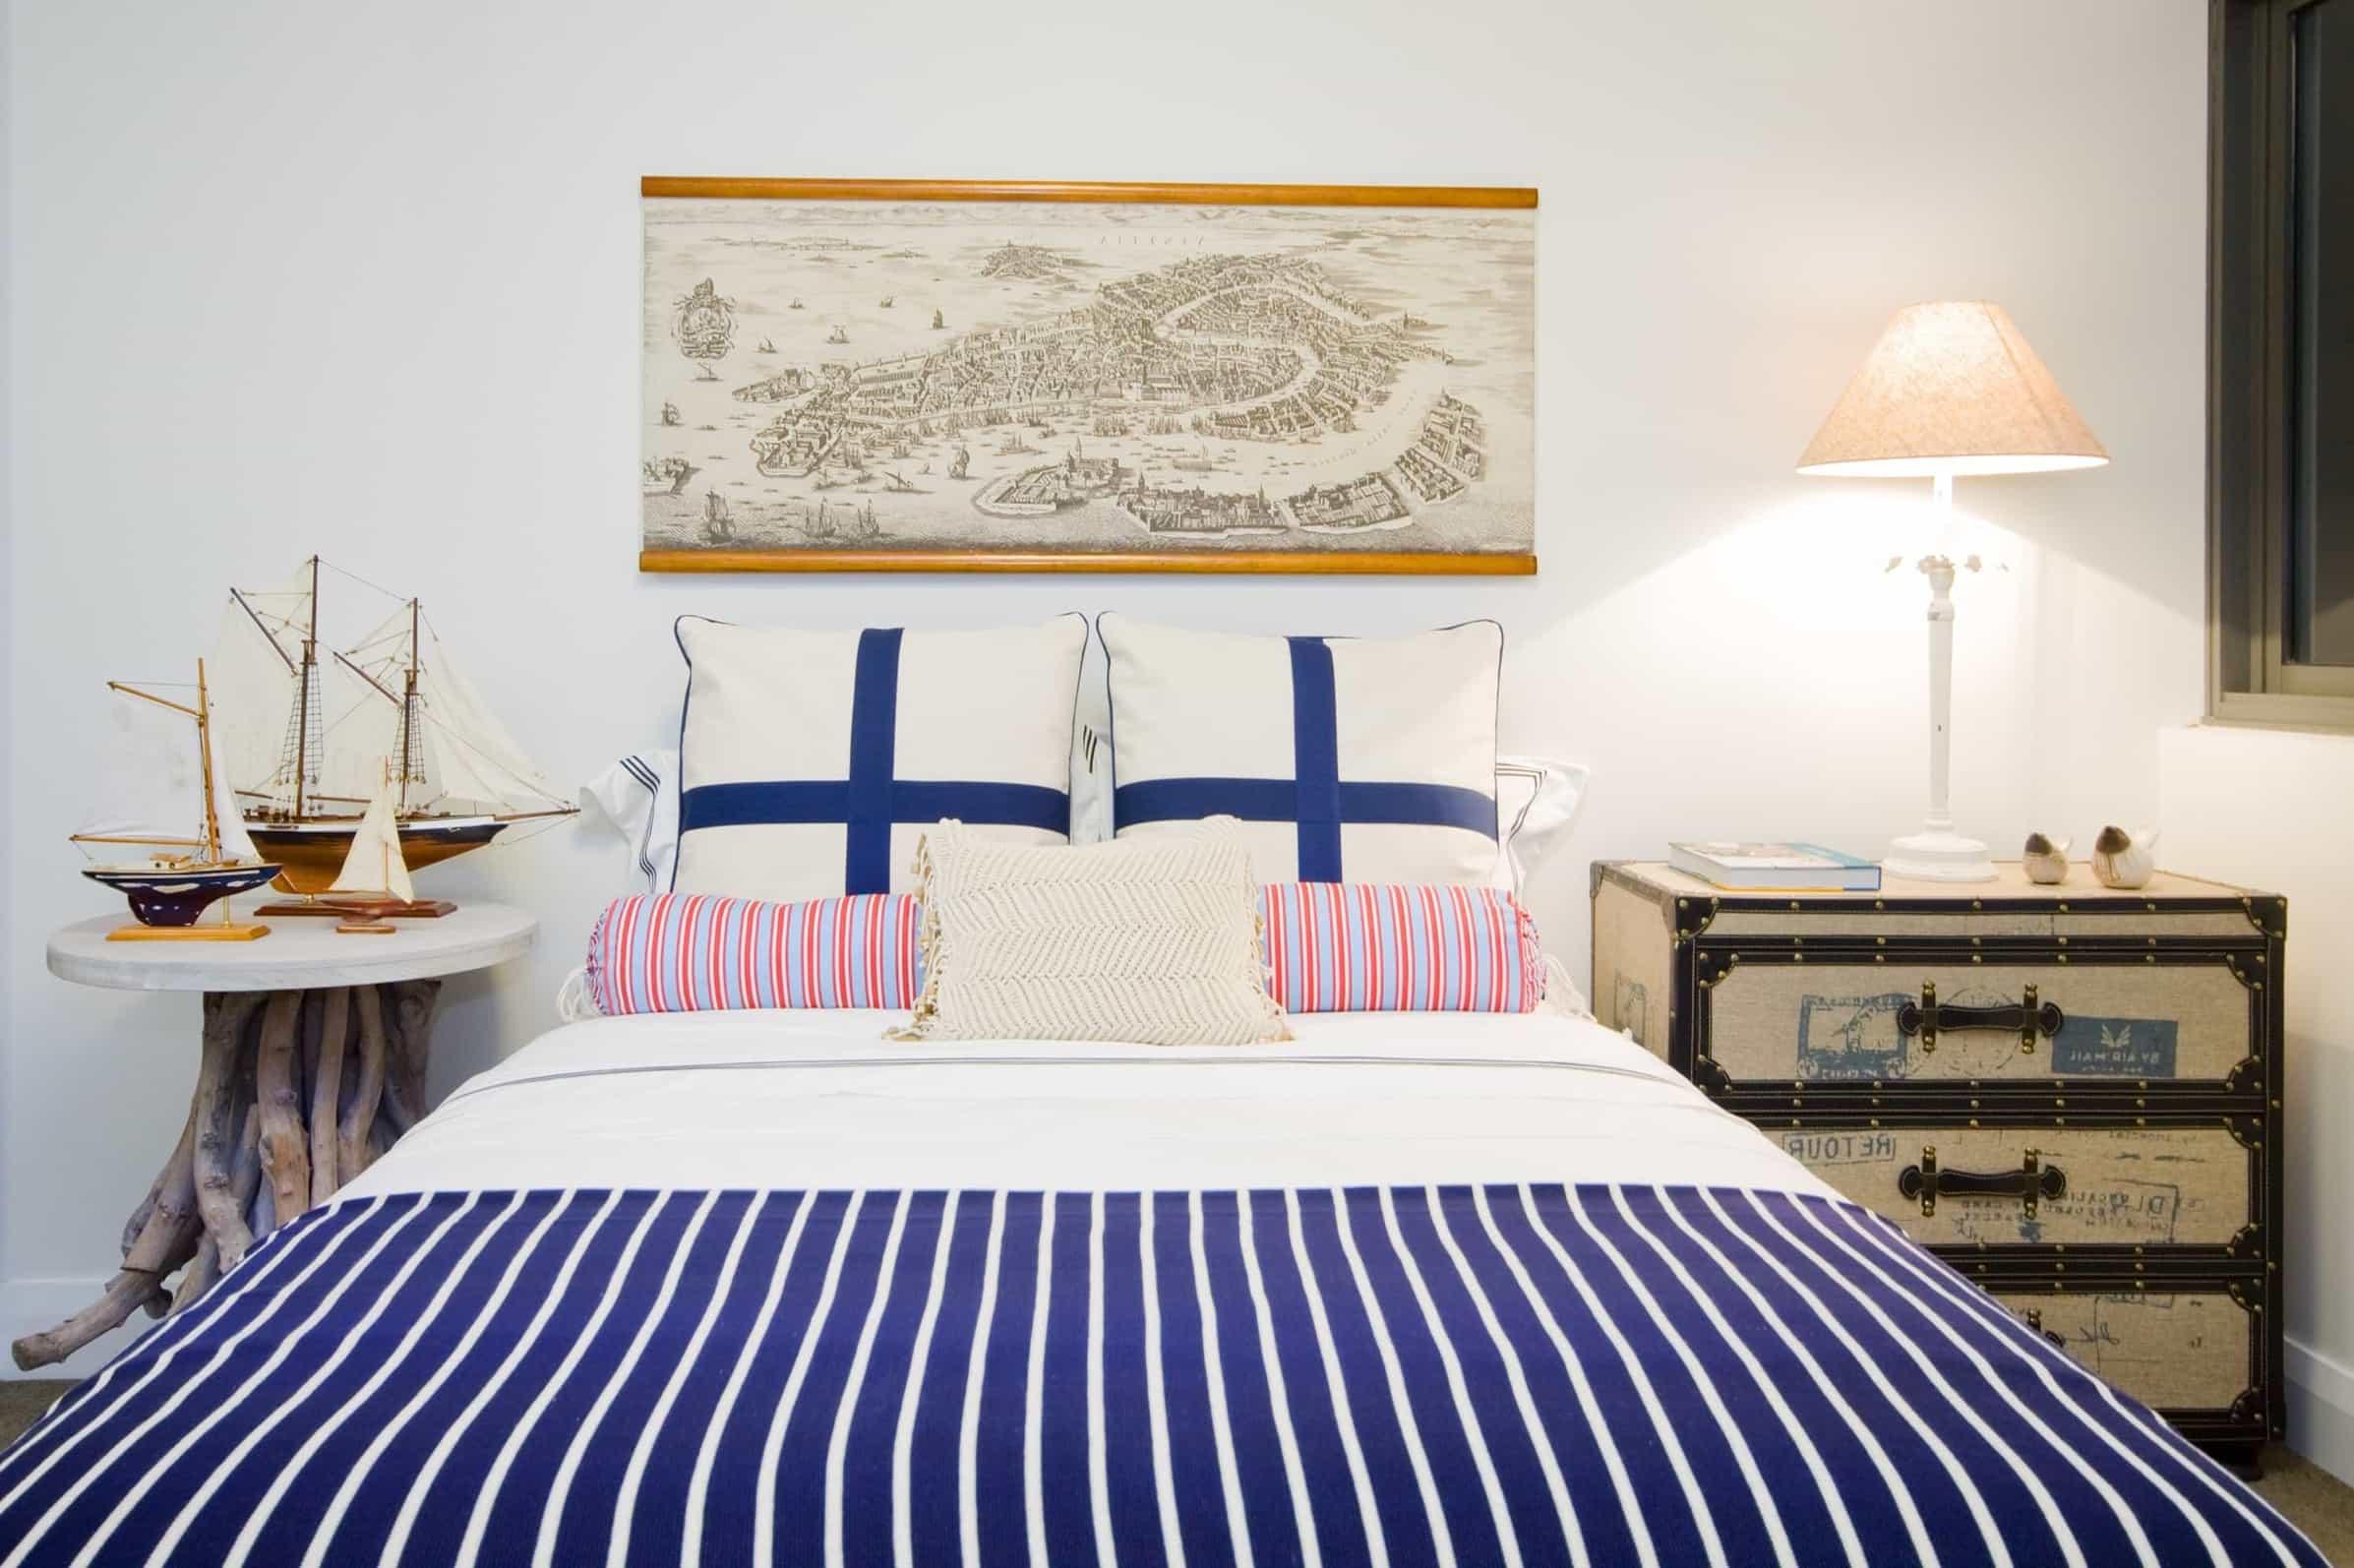 Wonderful nautical bedroom